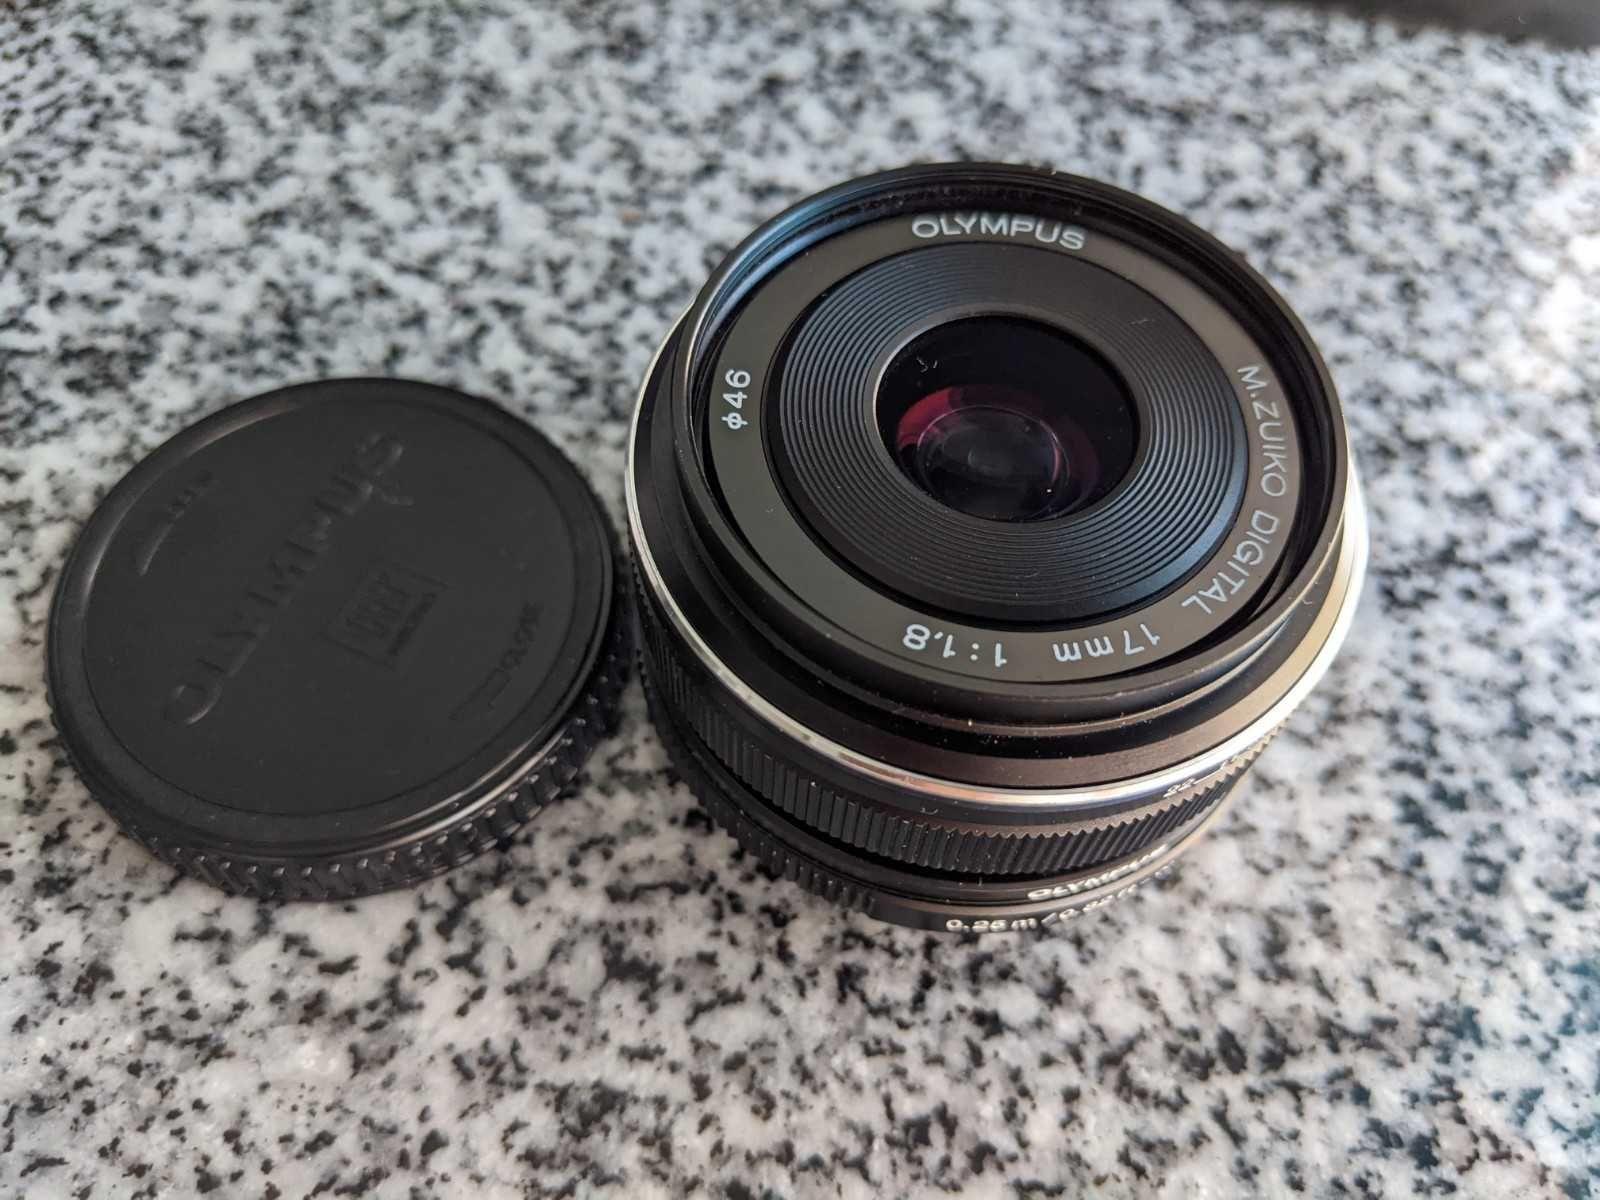 Olympus M.Zuiko 17mm F1.8 (c/nova)